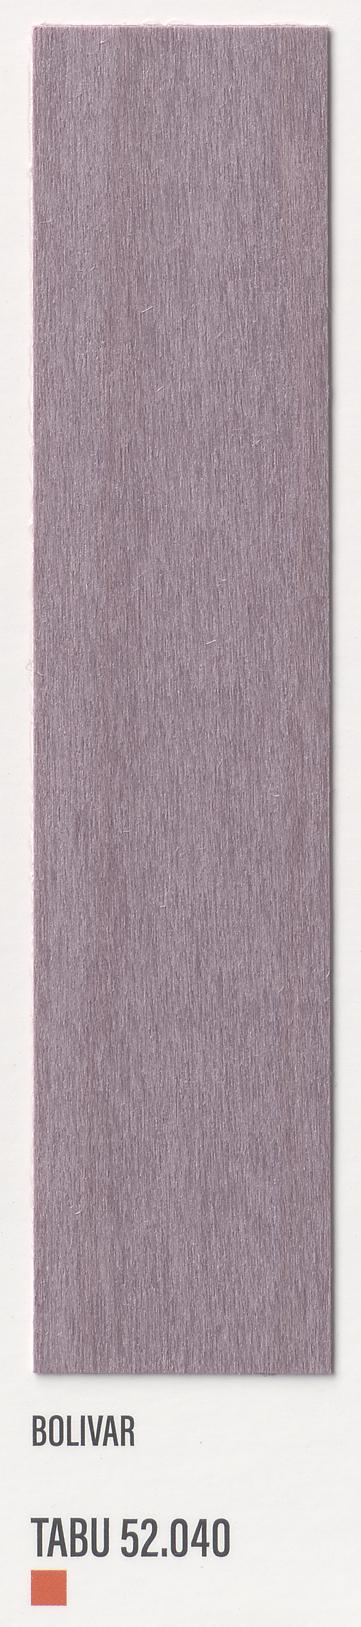 C19-(300dpi)(20181031)